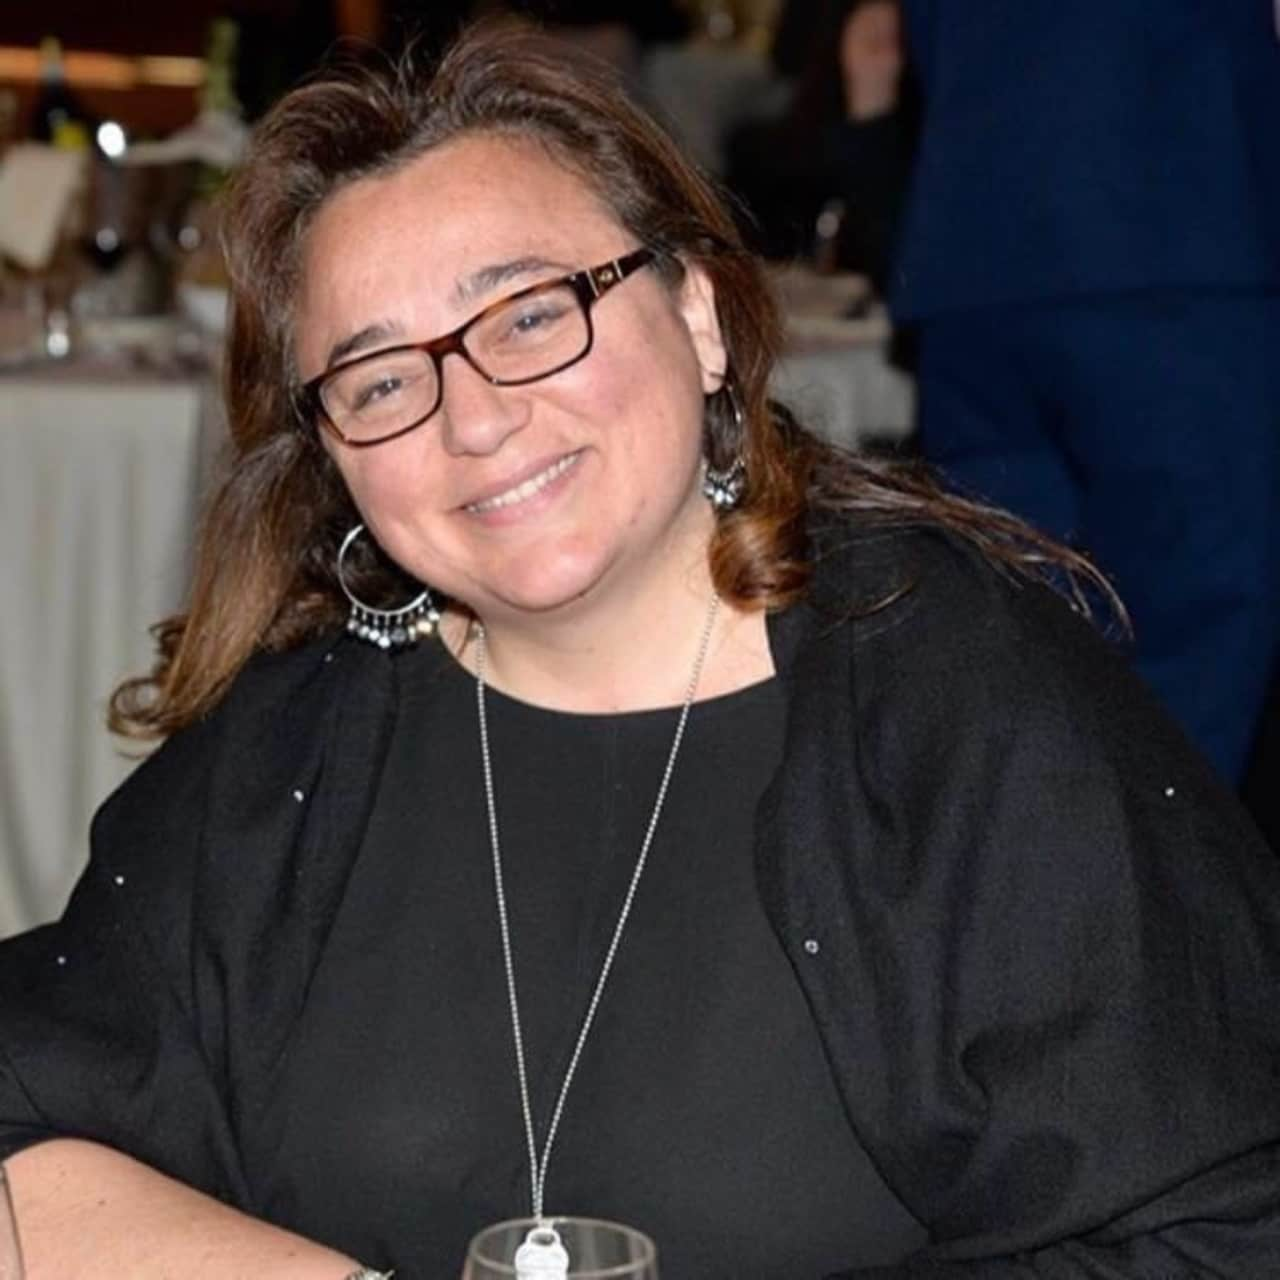 Maddalena Milone